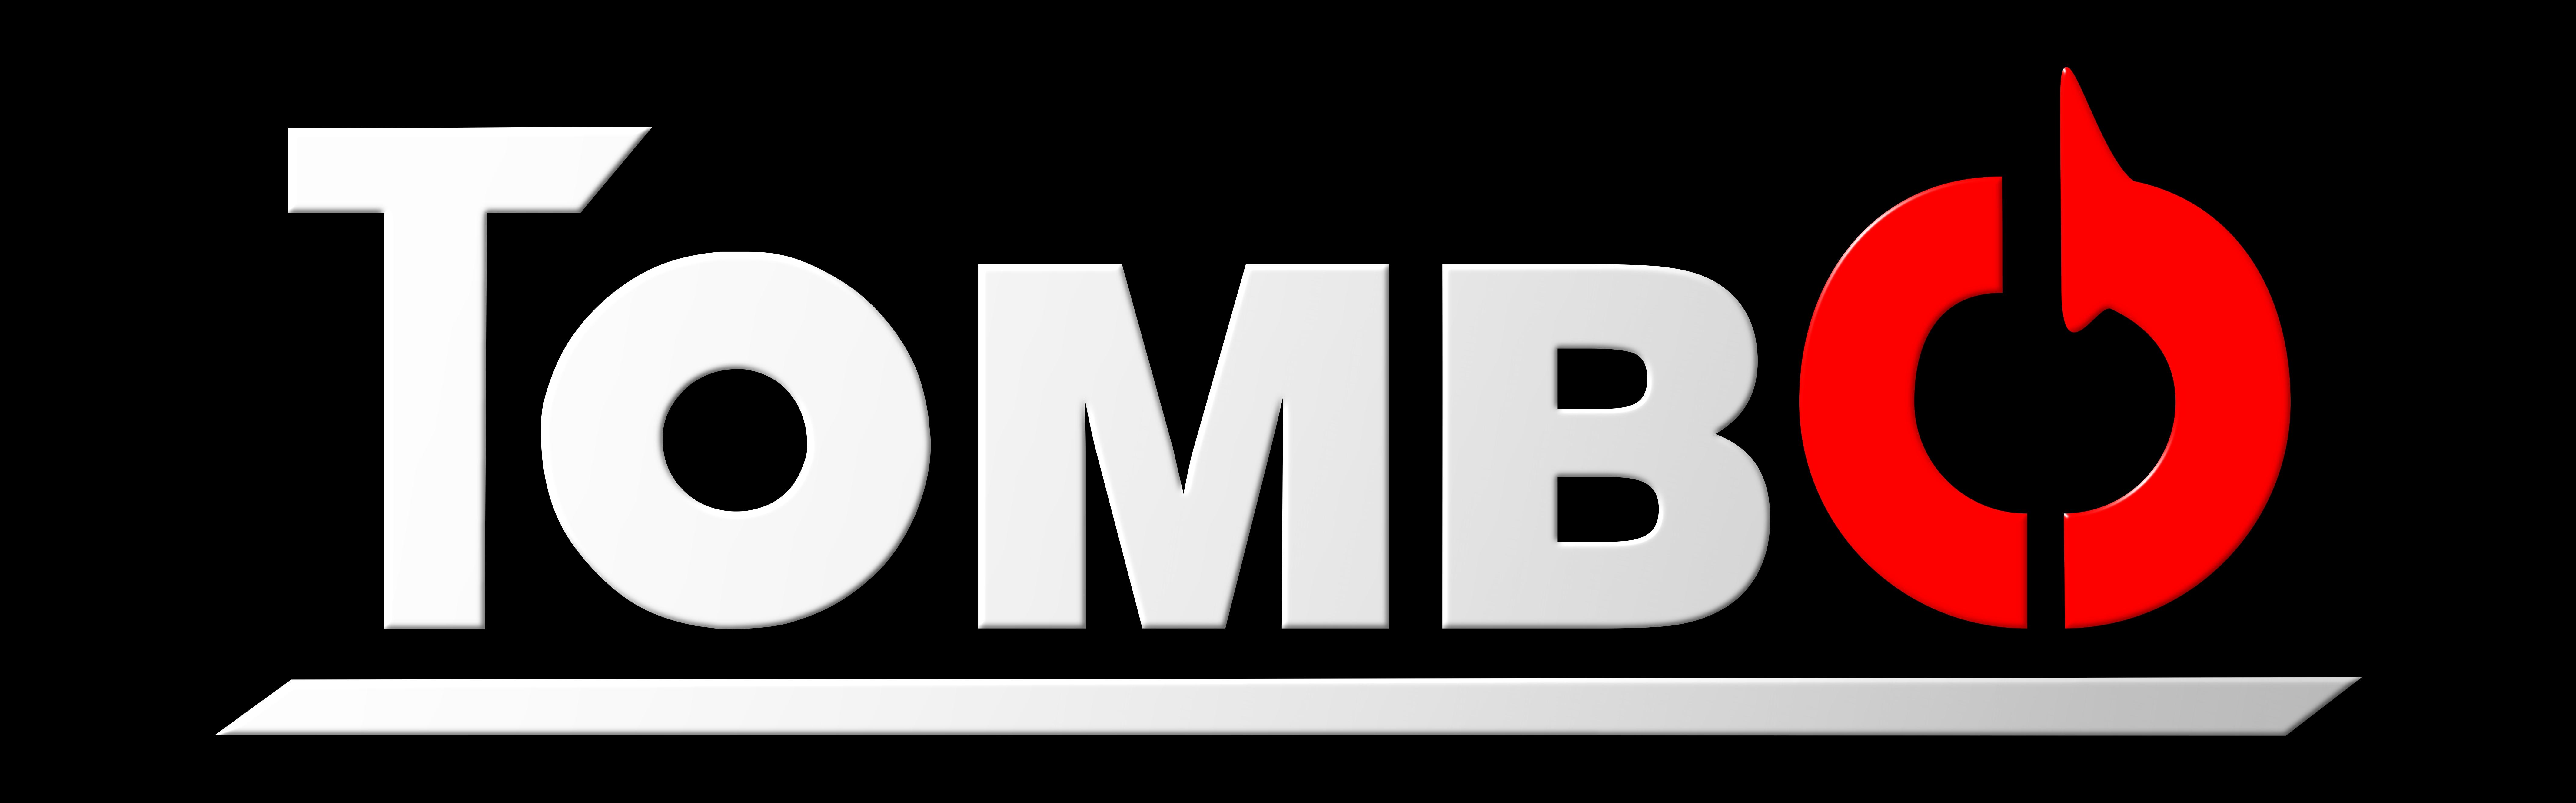 Tombo-Logo_hell-auf-schwarz